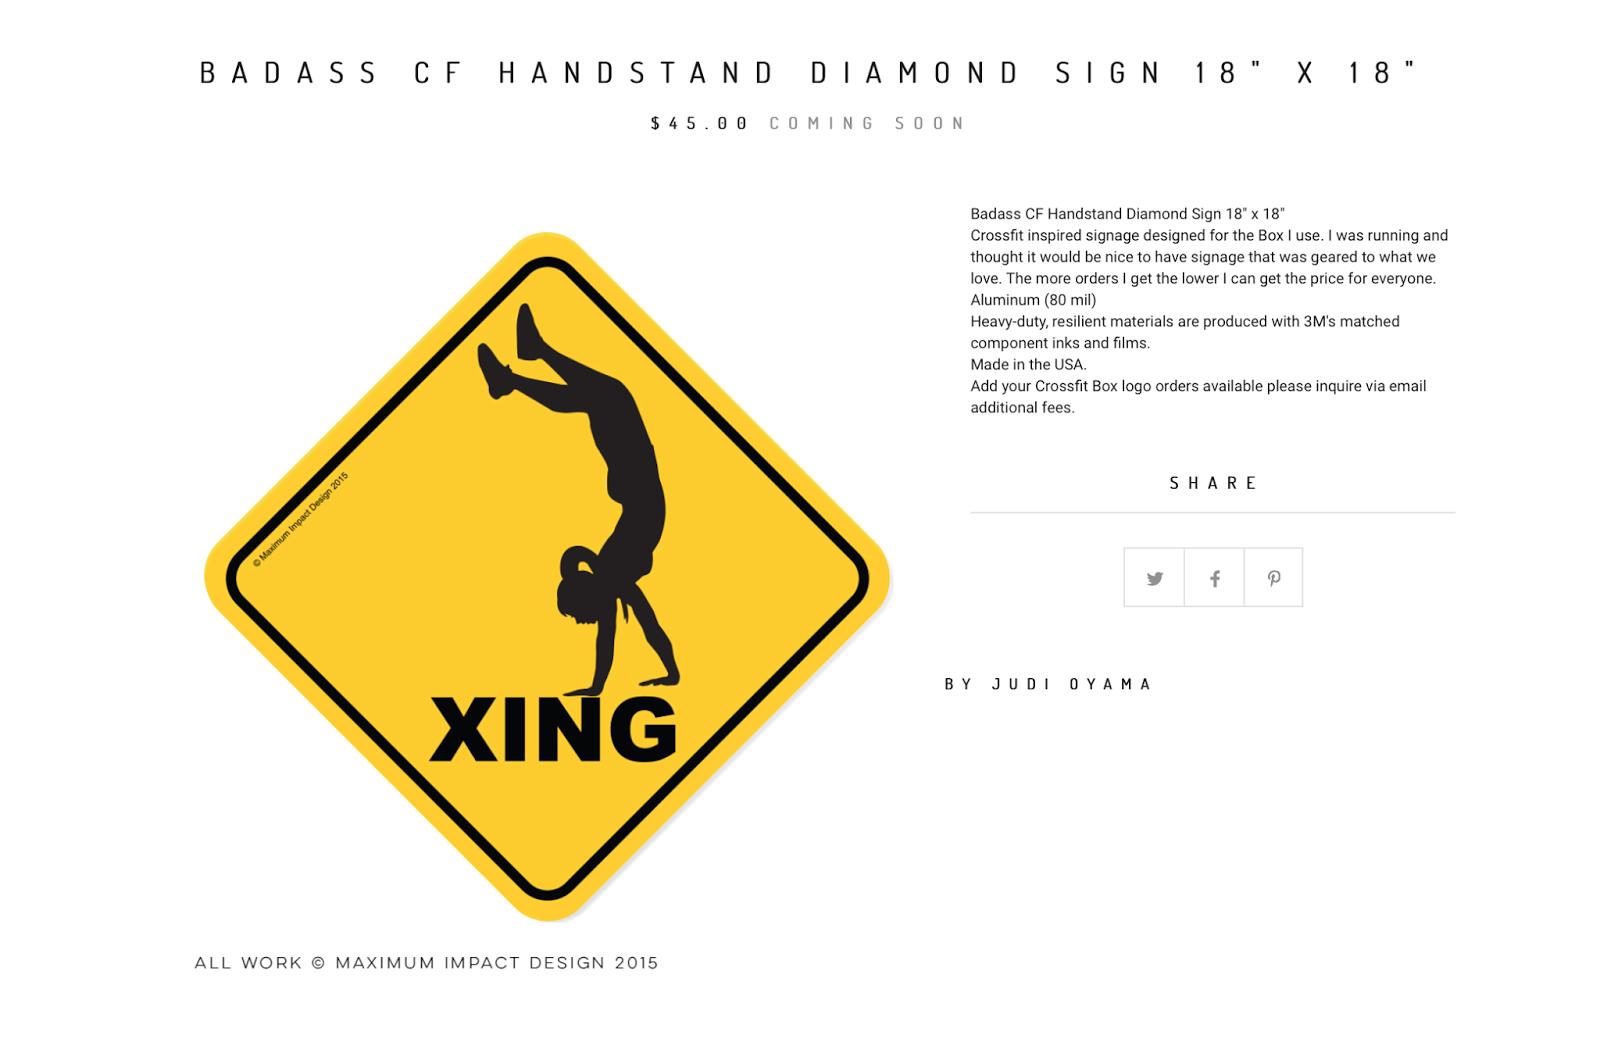 Crossfit signs